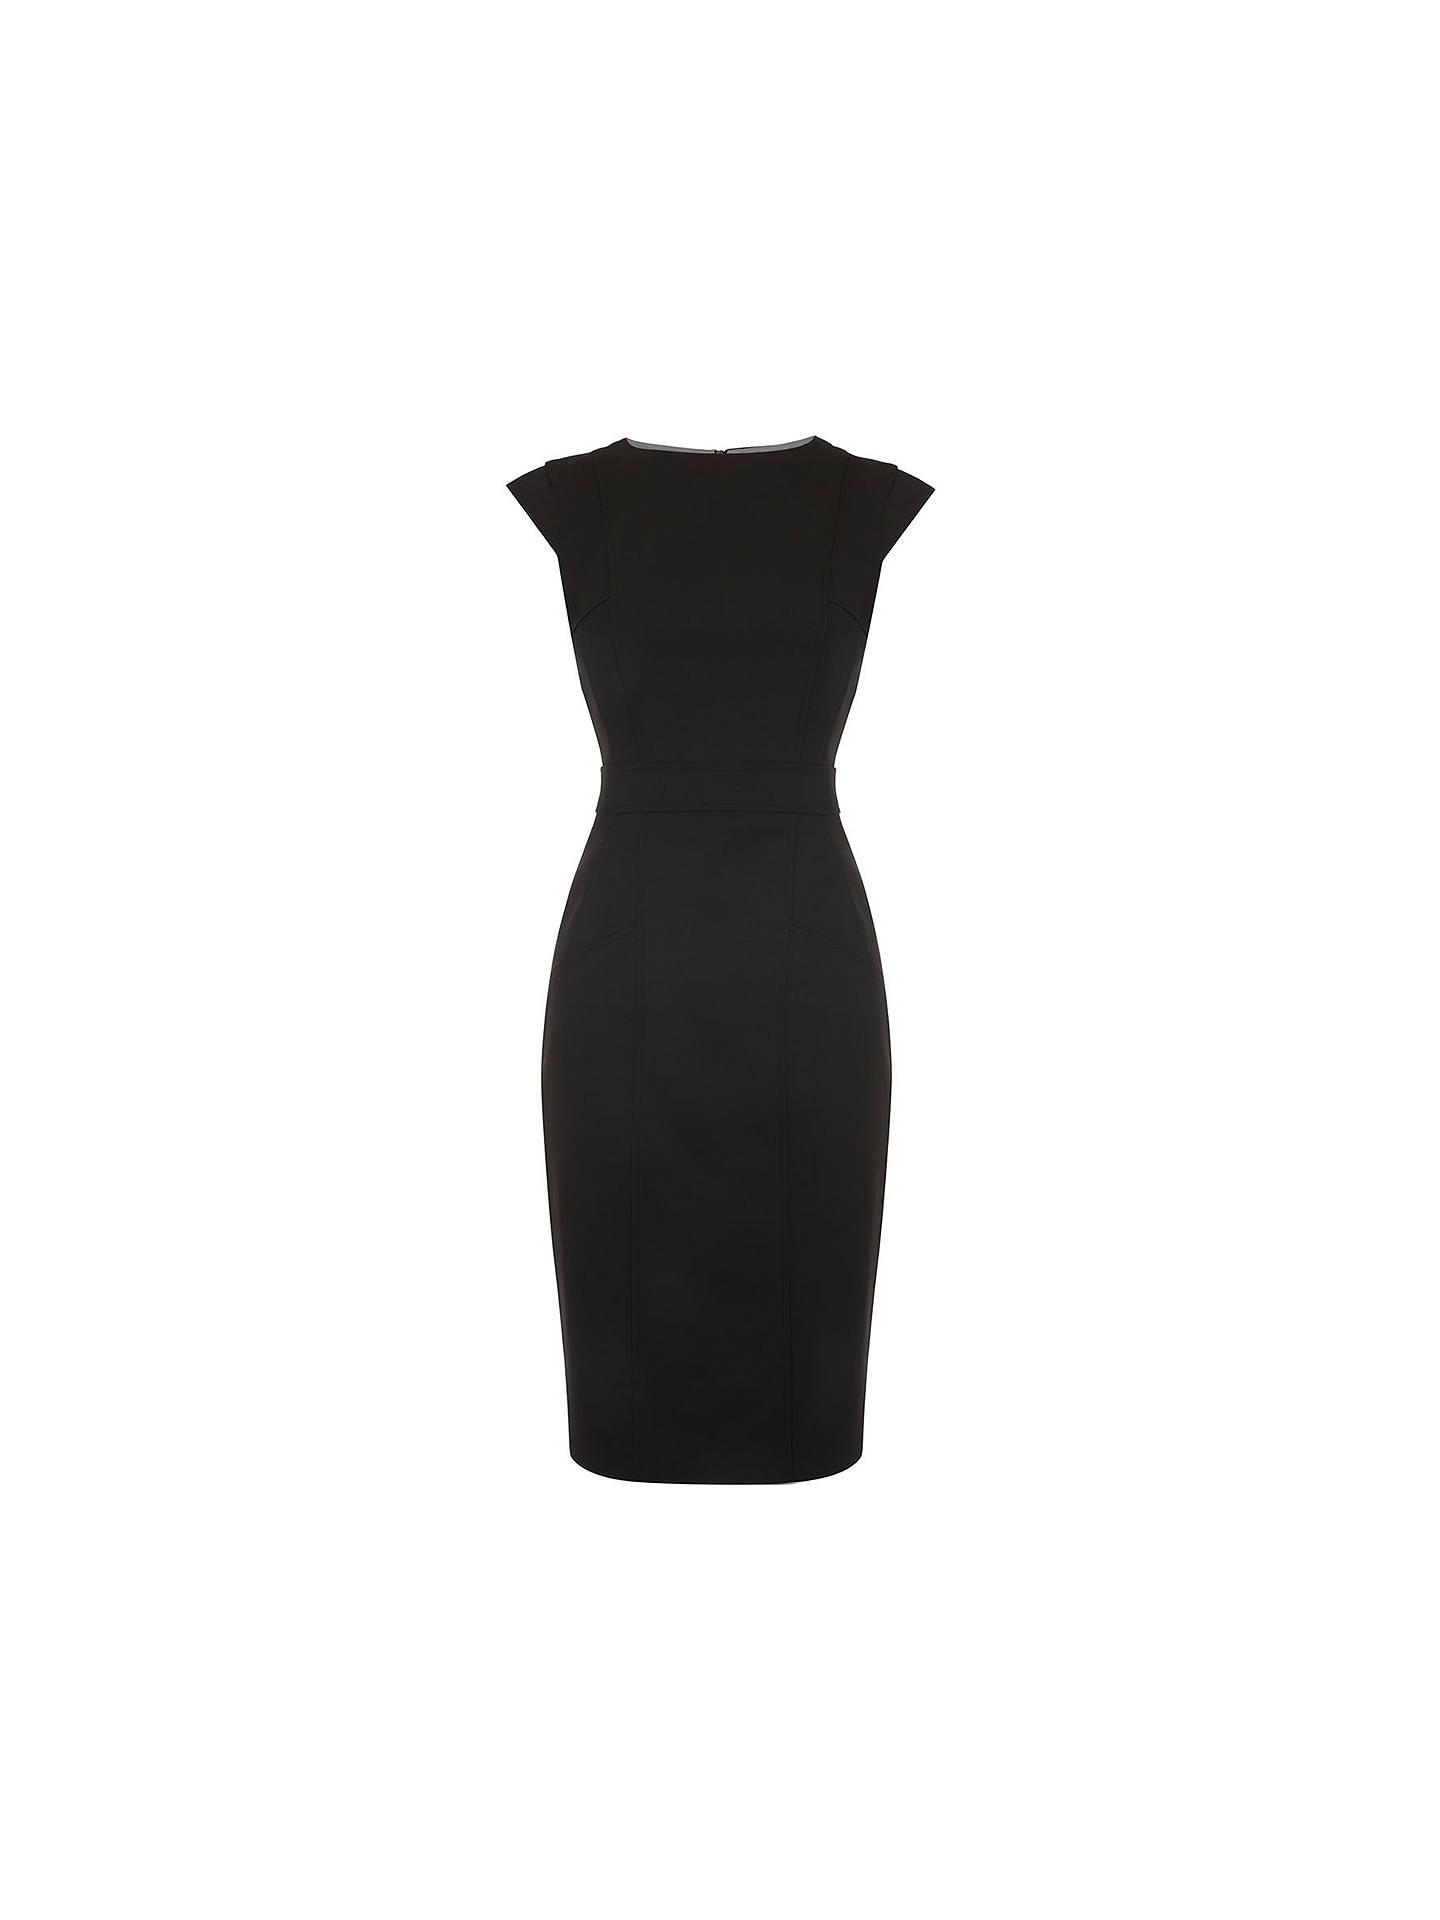 577395063ce7 ... Buy Oasis Tailored Midi Dress, Black, 6 Online at johnlewis.com ...